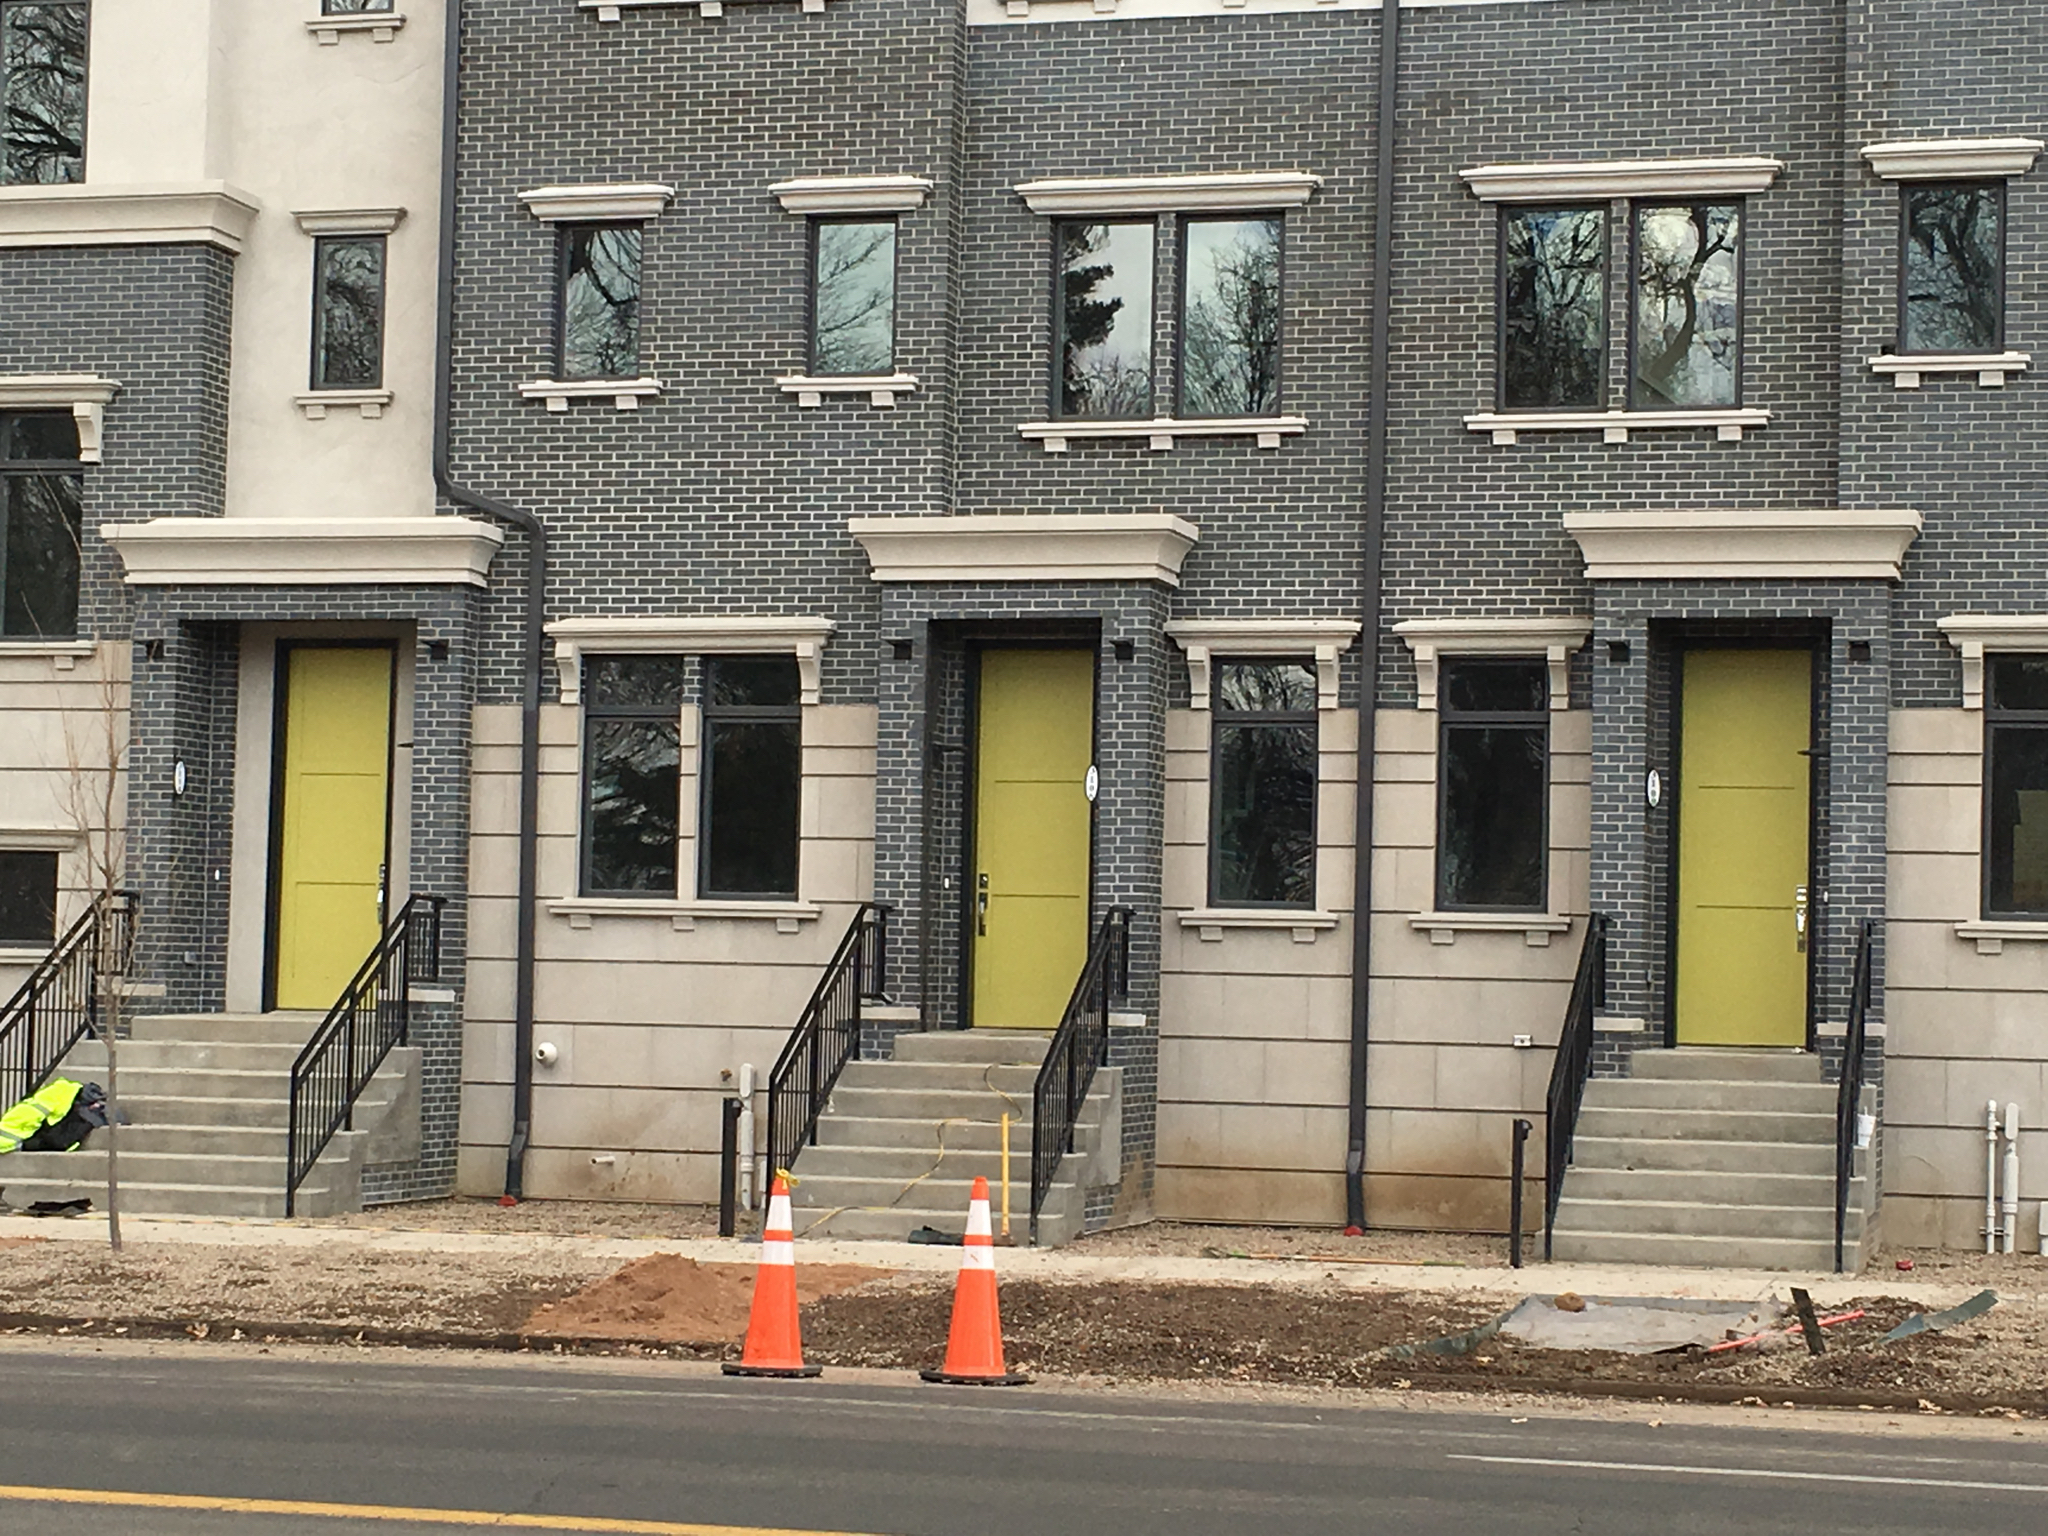 03-21-16-apartment-building-closeup-doors.jpg